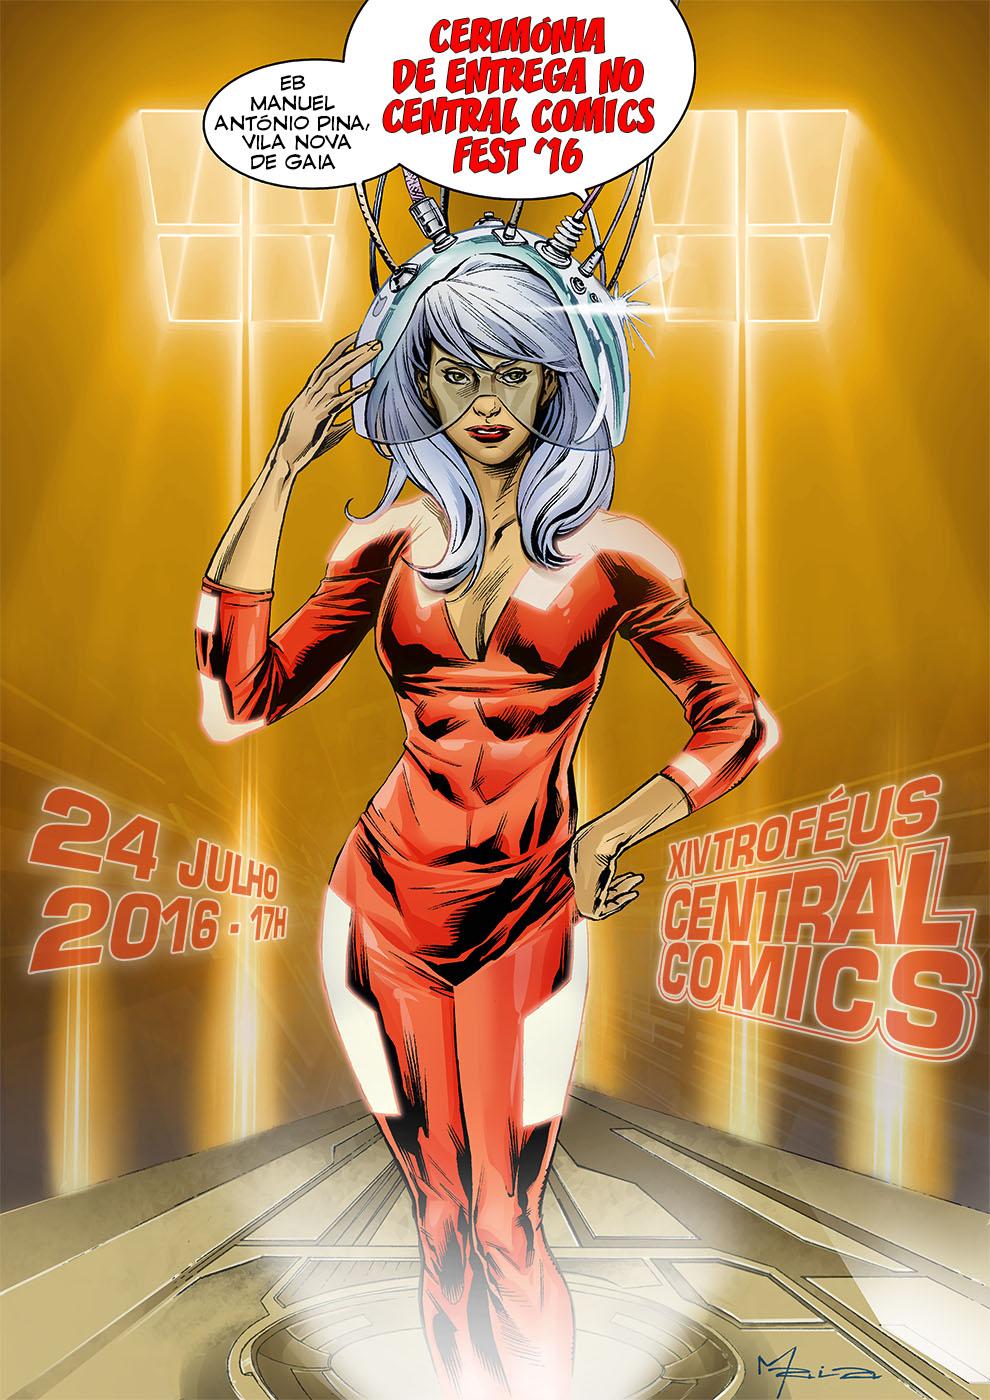 XIV Troféus Central Comics